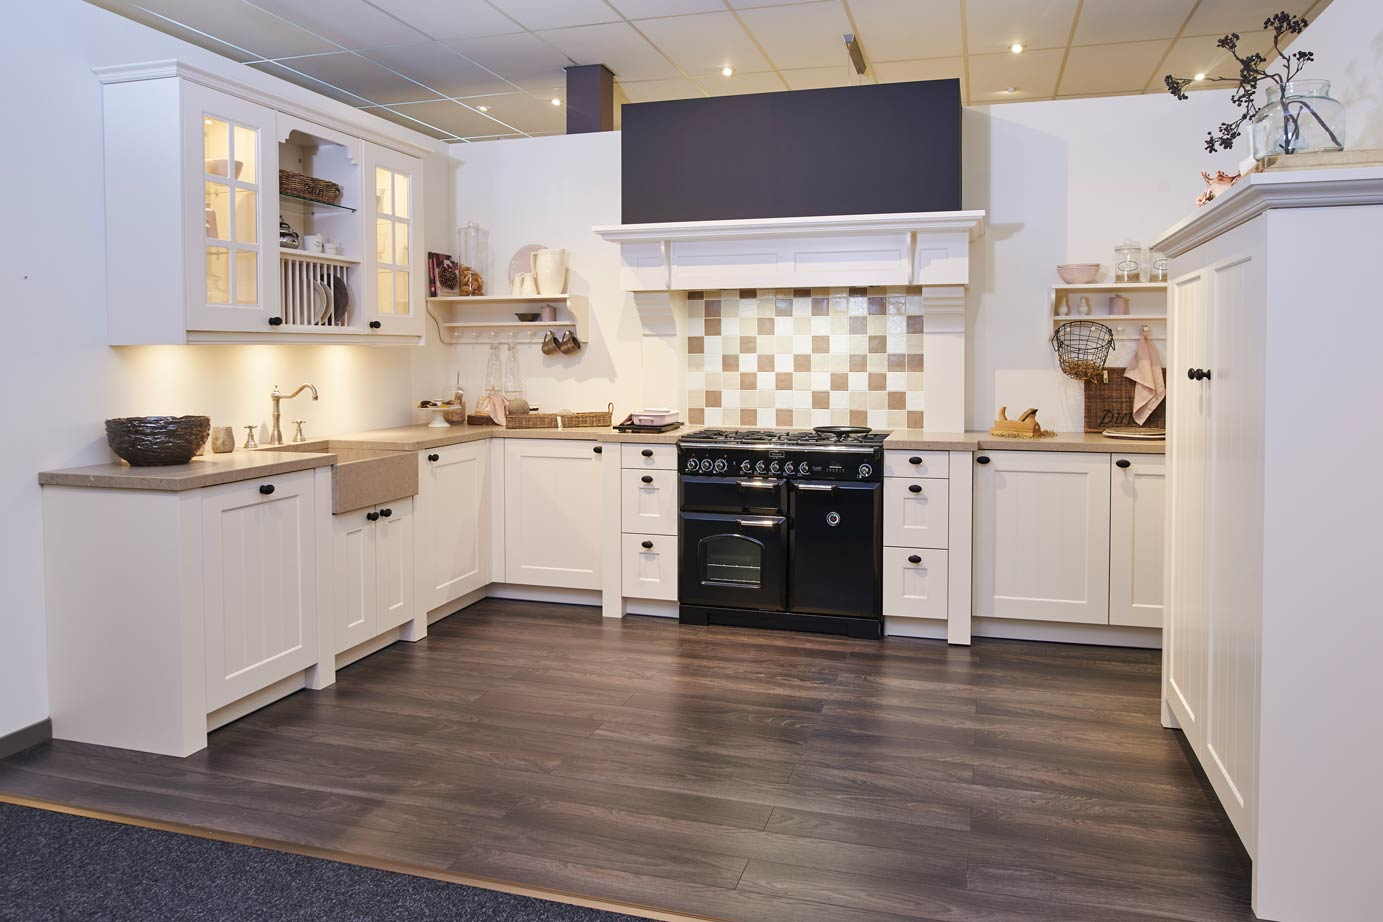 tegels keuken fornuis : Grote Landelijke Keuken Met Falcon Fornuis Db Keukens